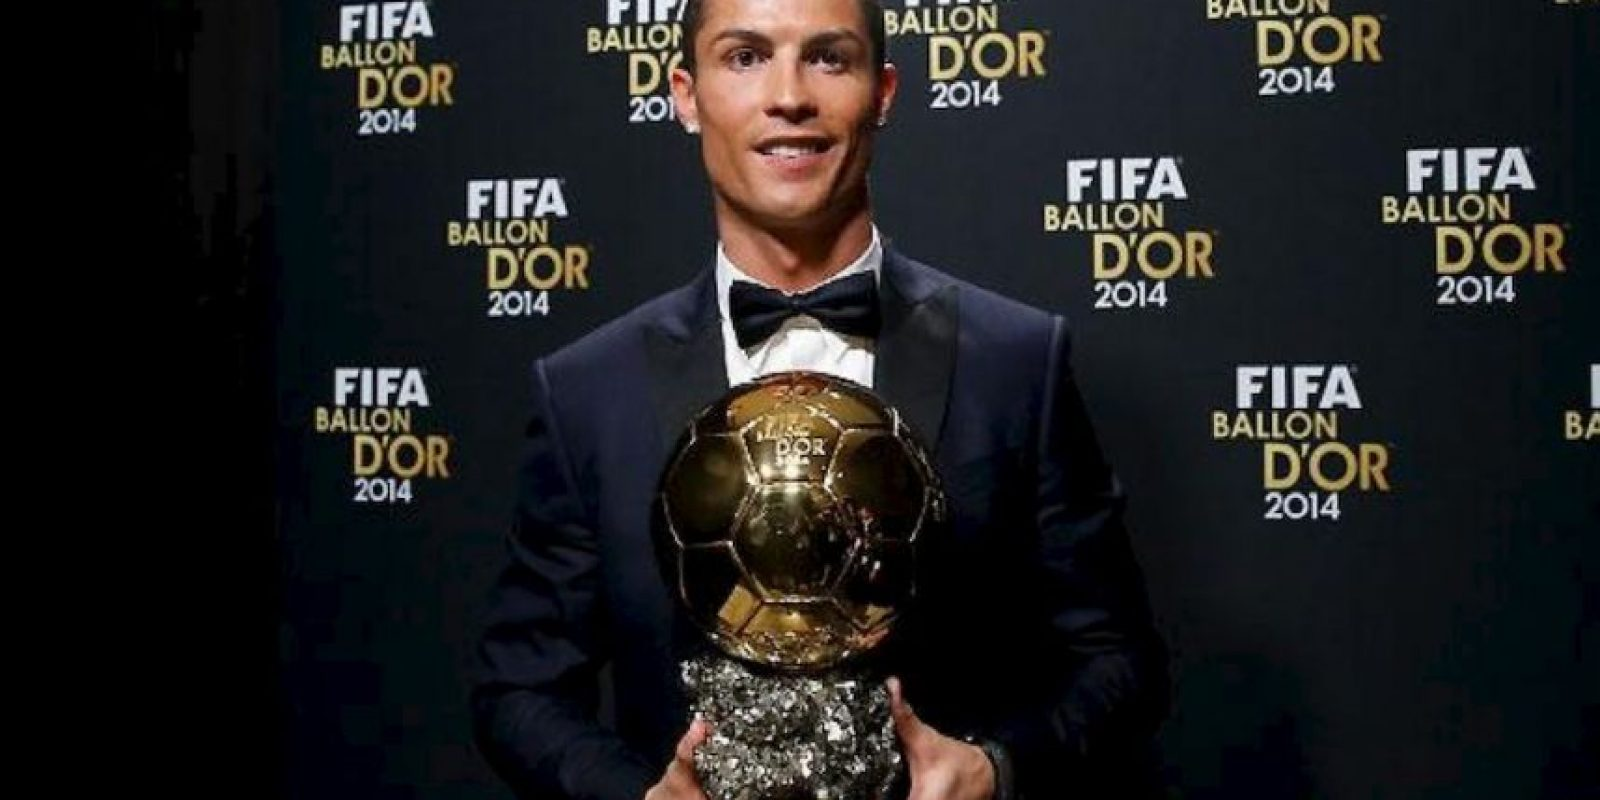 Cristiano Ronaldo ganó el Balón de Oro 2014. Foto:twitter.com/realmadrid